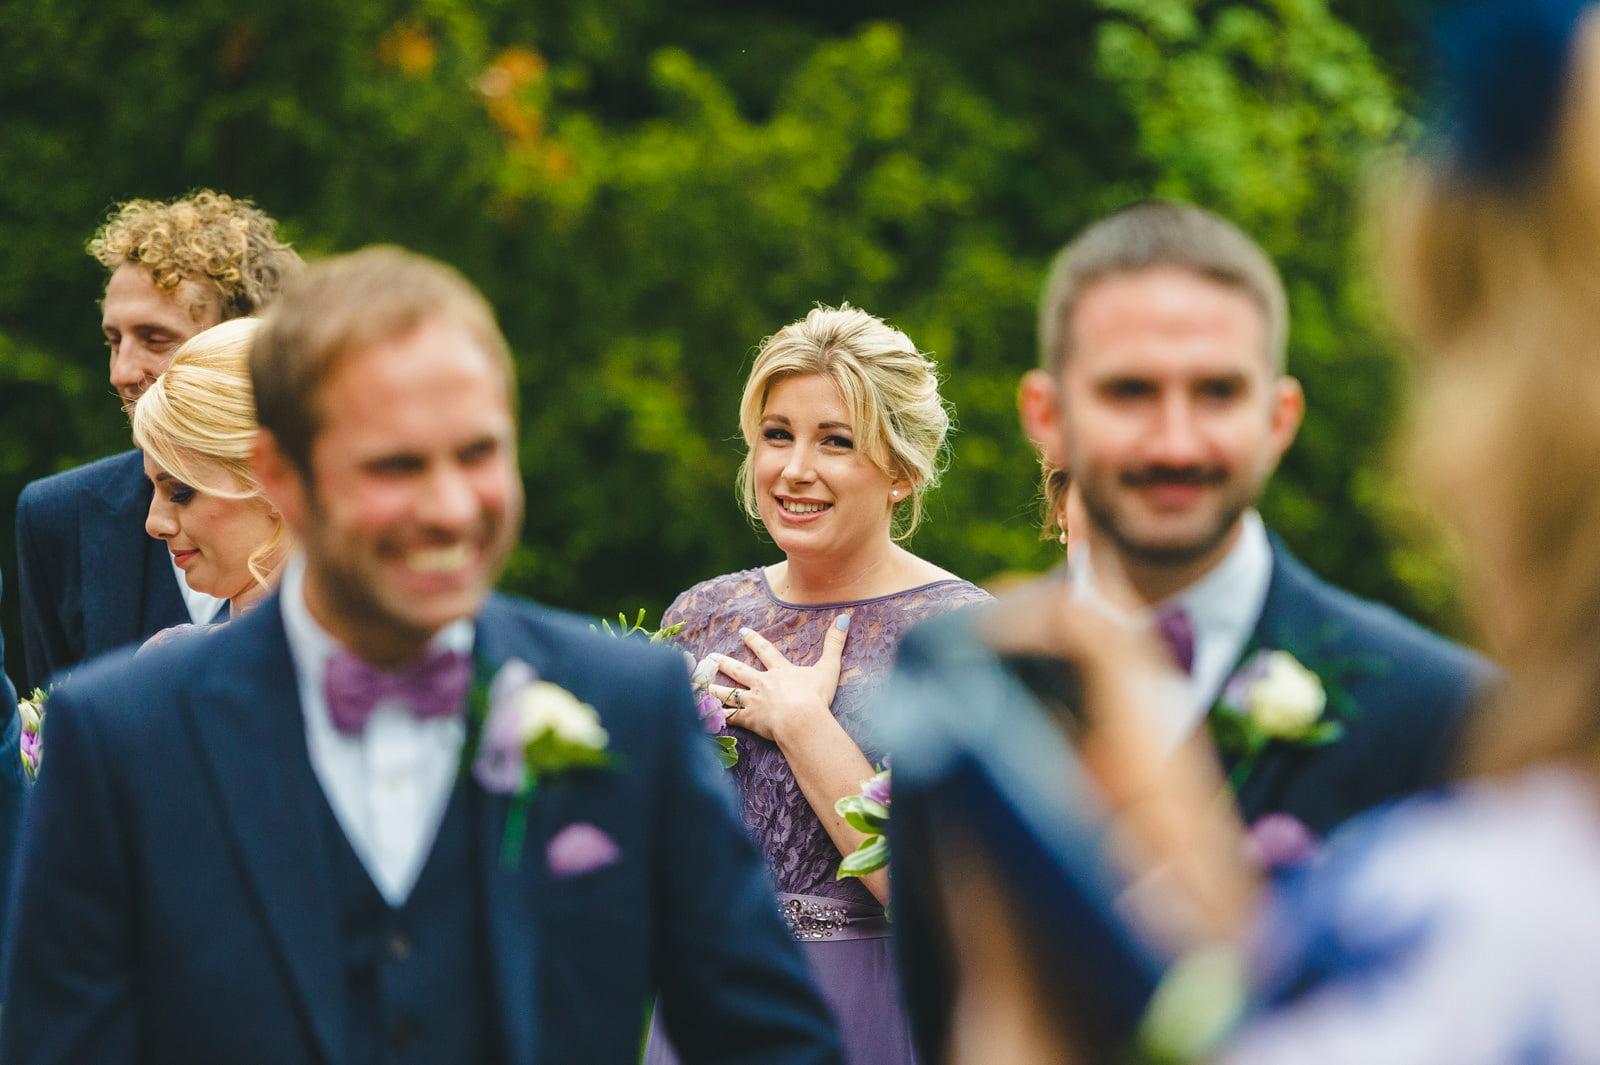 Millers Of Netley wedding, Dorrington, Shrewsbury | Emma + Ben 22